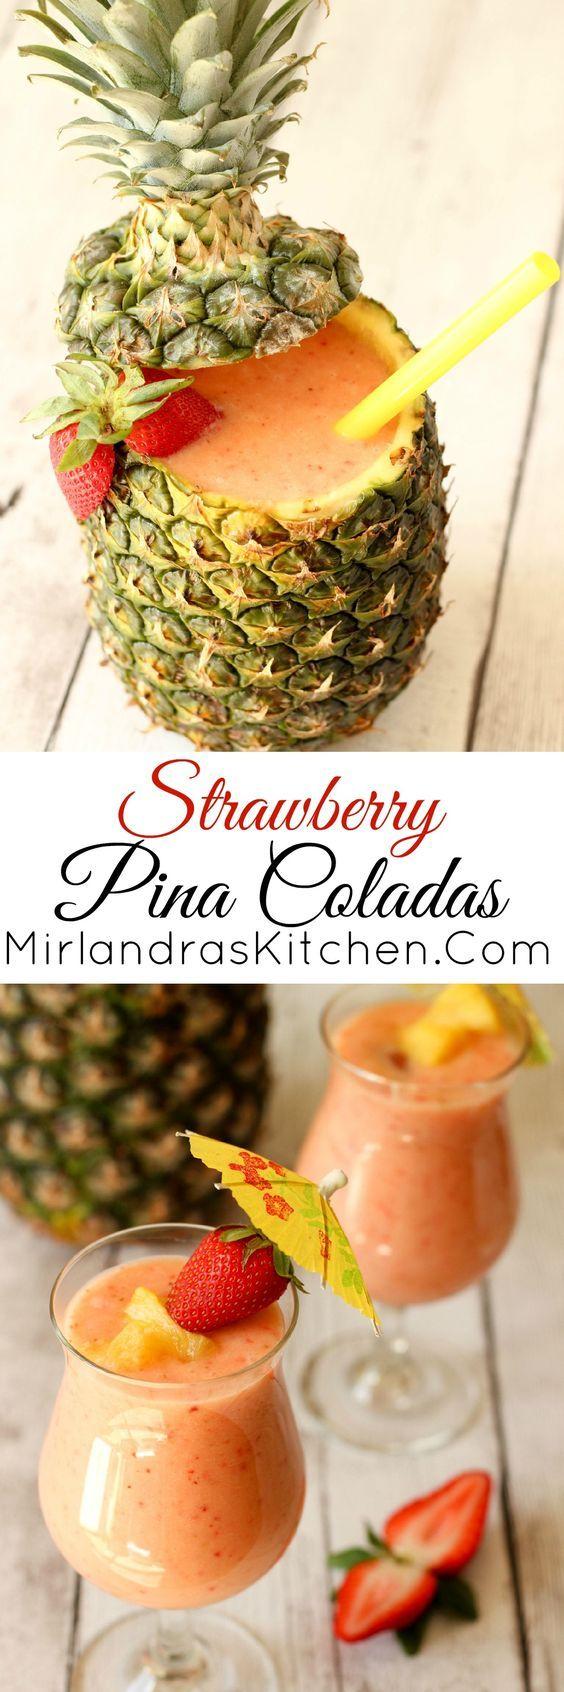 Summertime Strawberry Pina Coladas